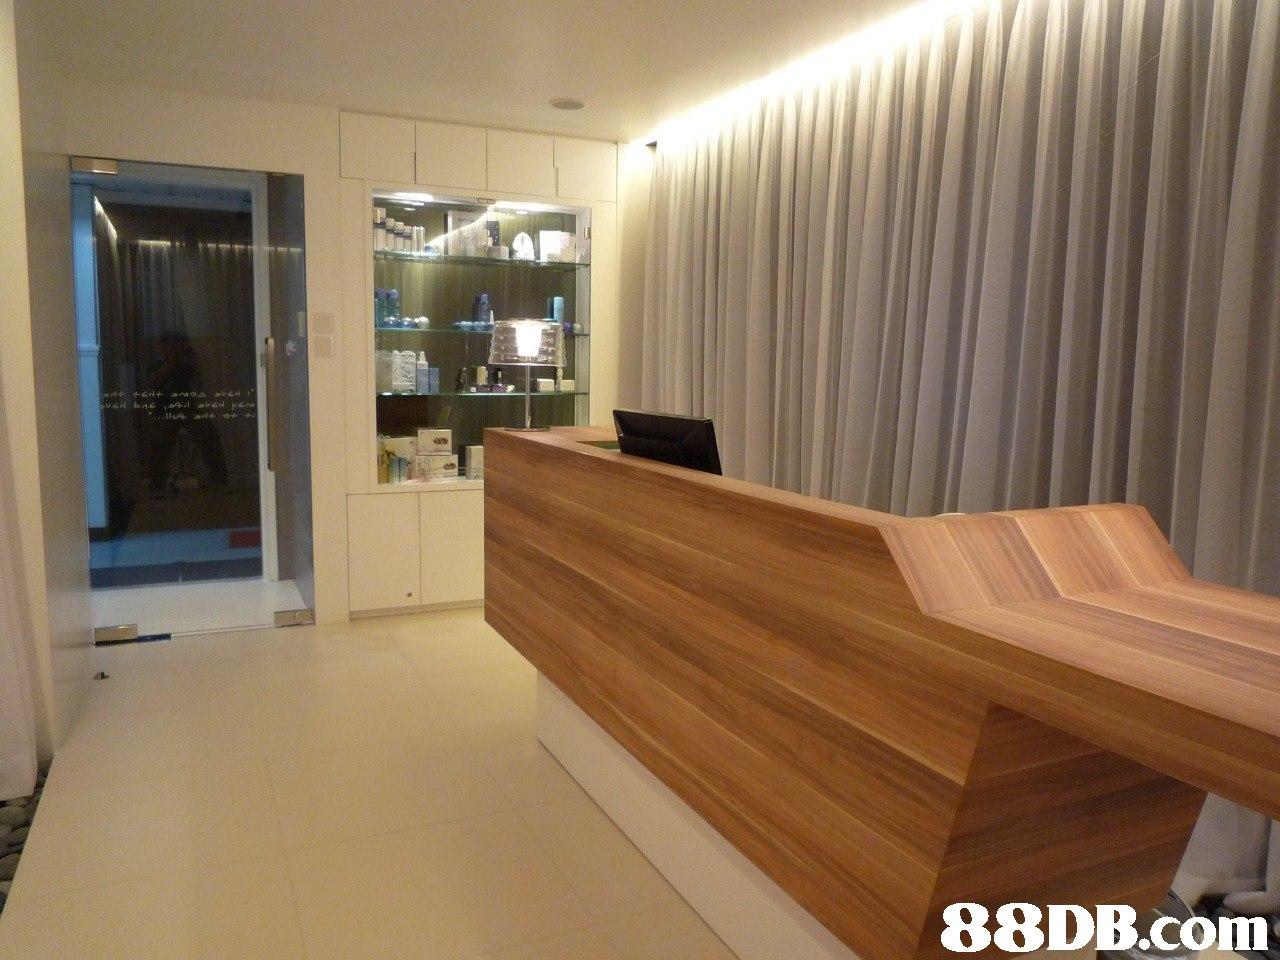 Property,Room,Interior design,Floor,Furniture